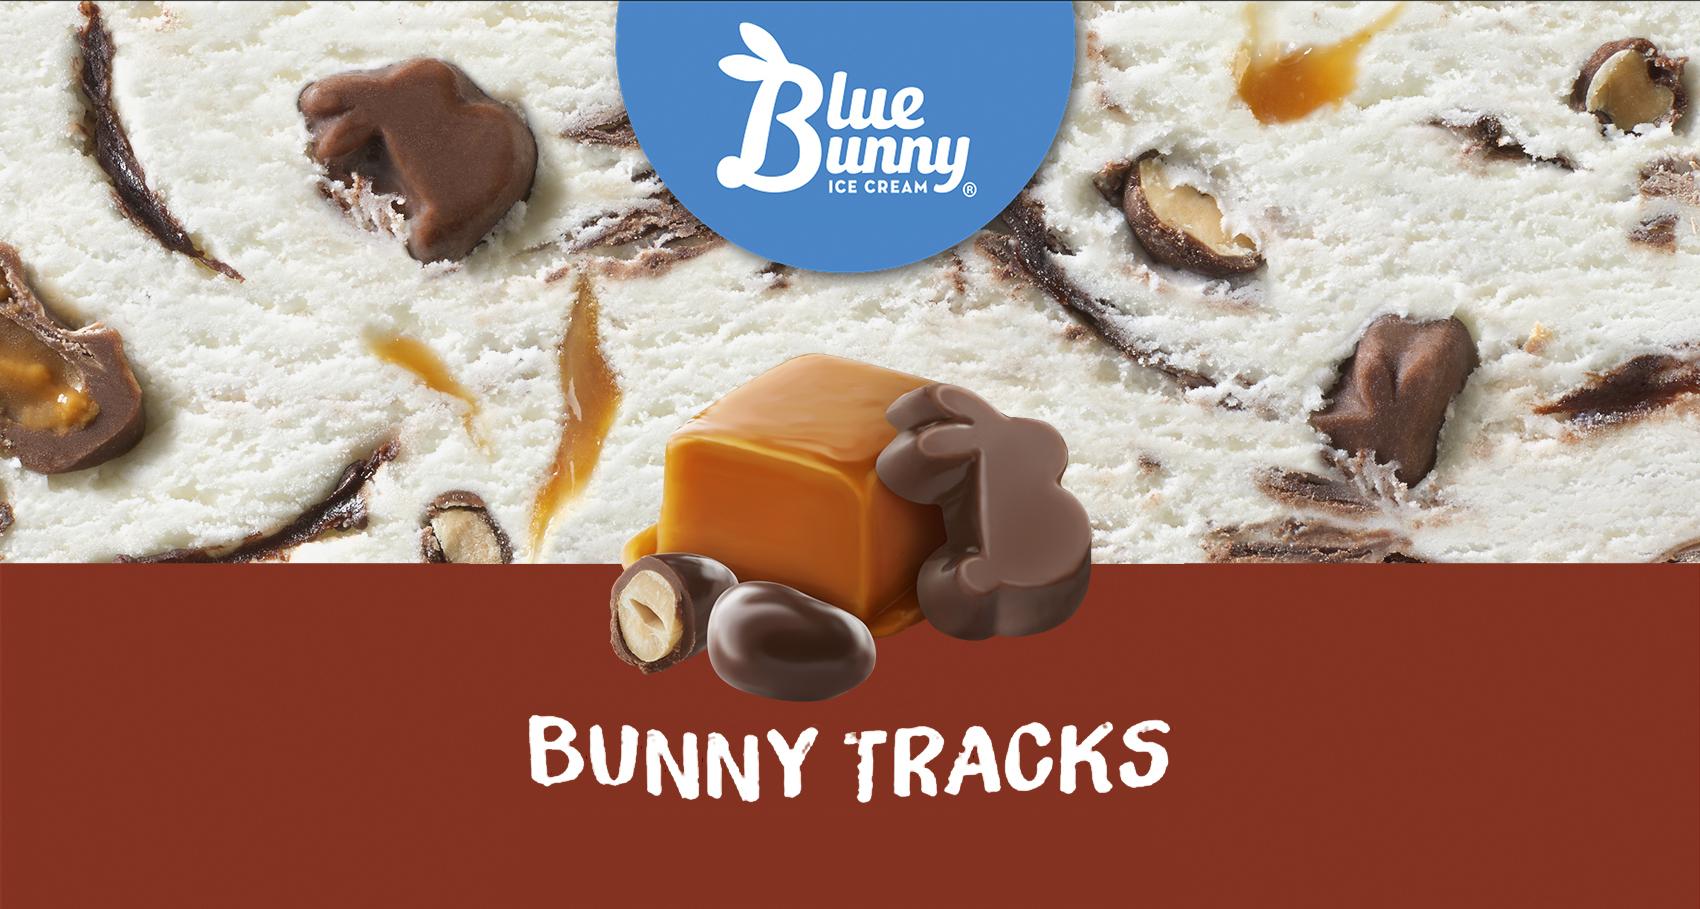 Blue_bunny_ice_cream_pint.jpg